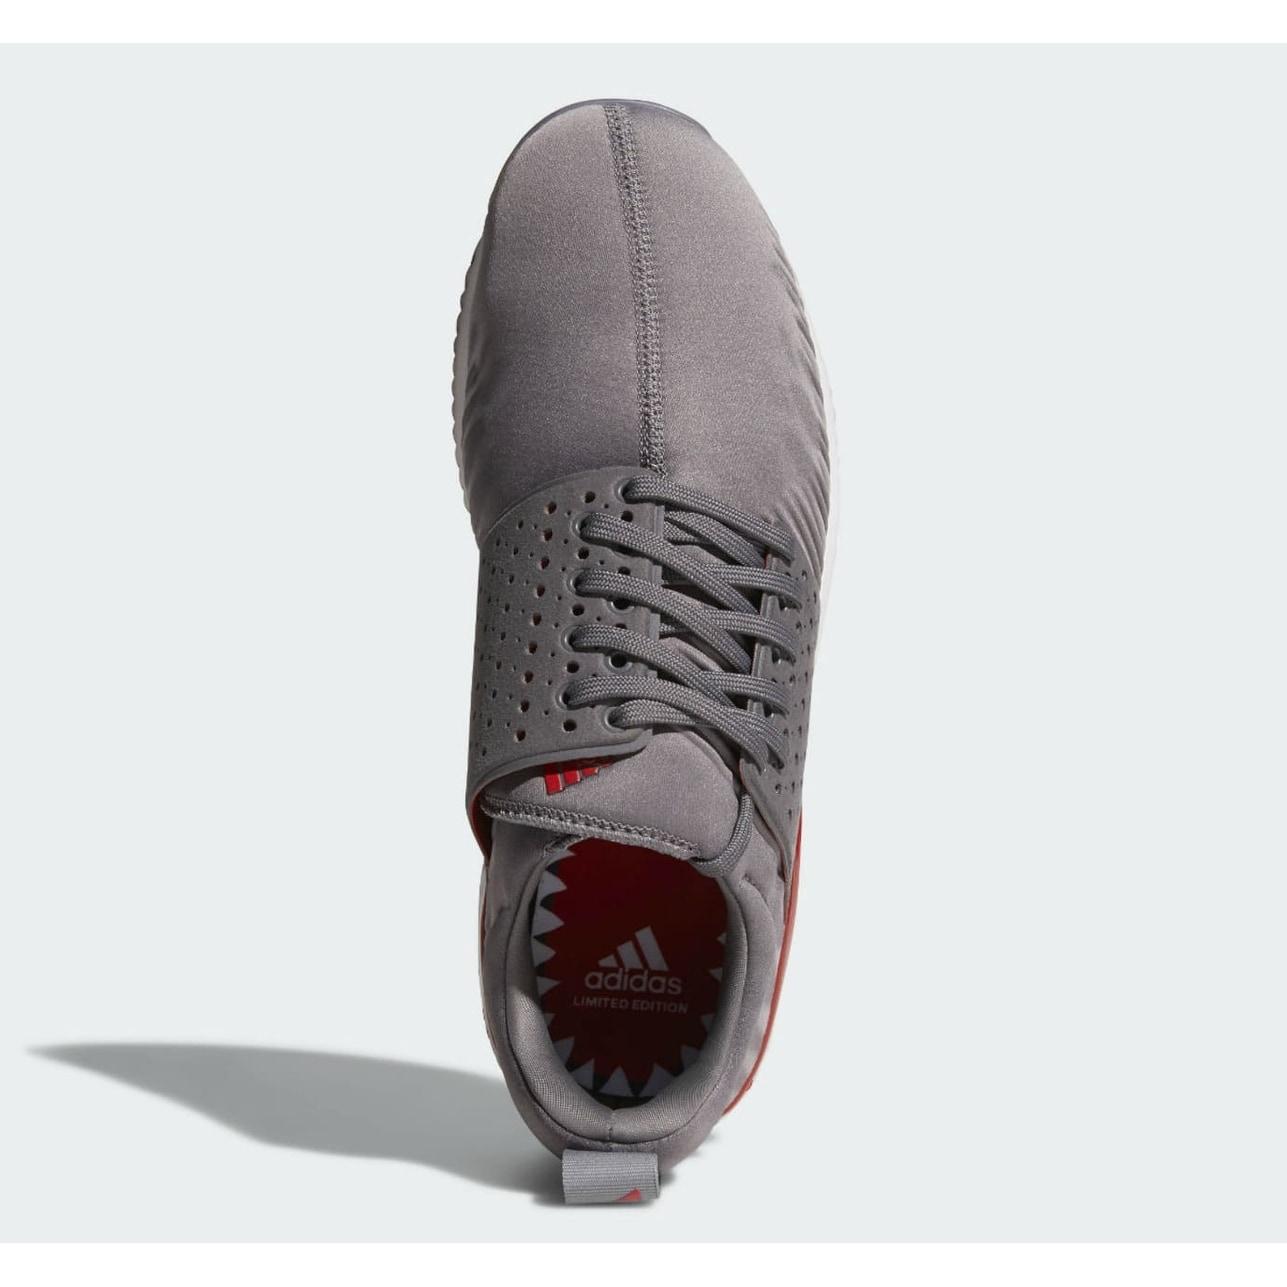 adidas shark shoes price